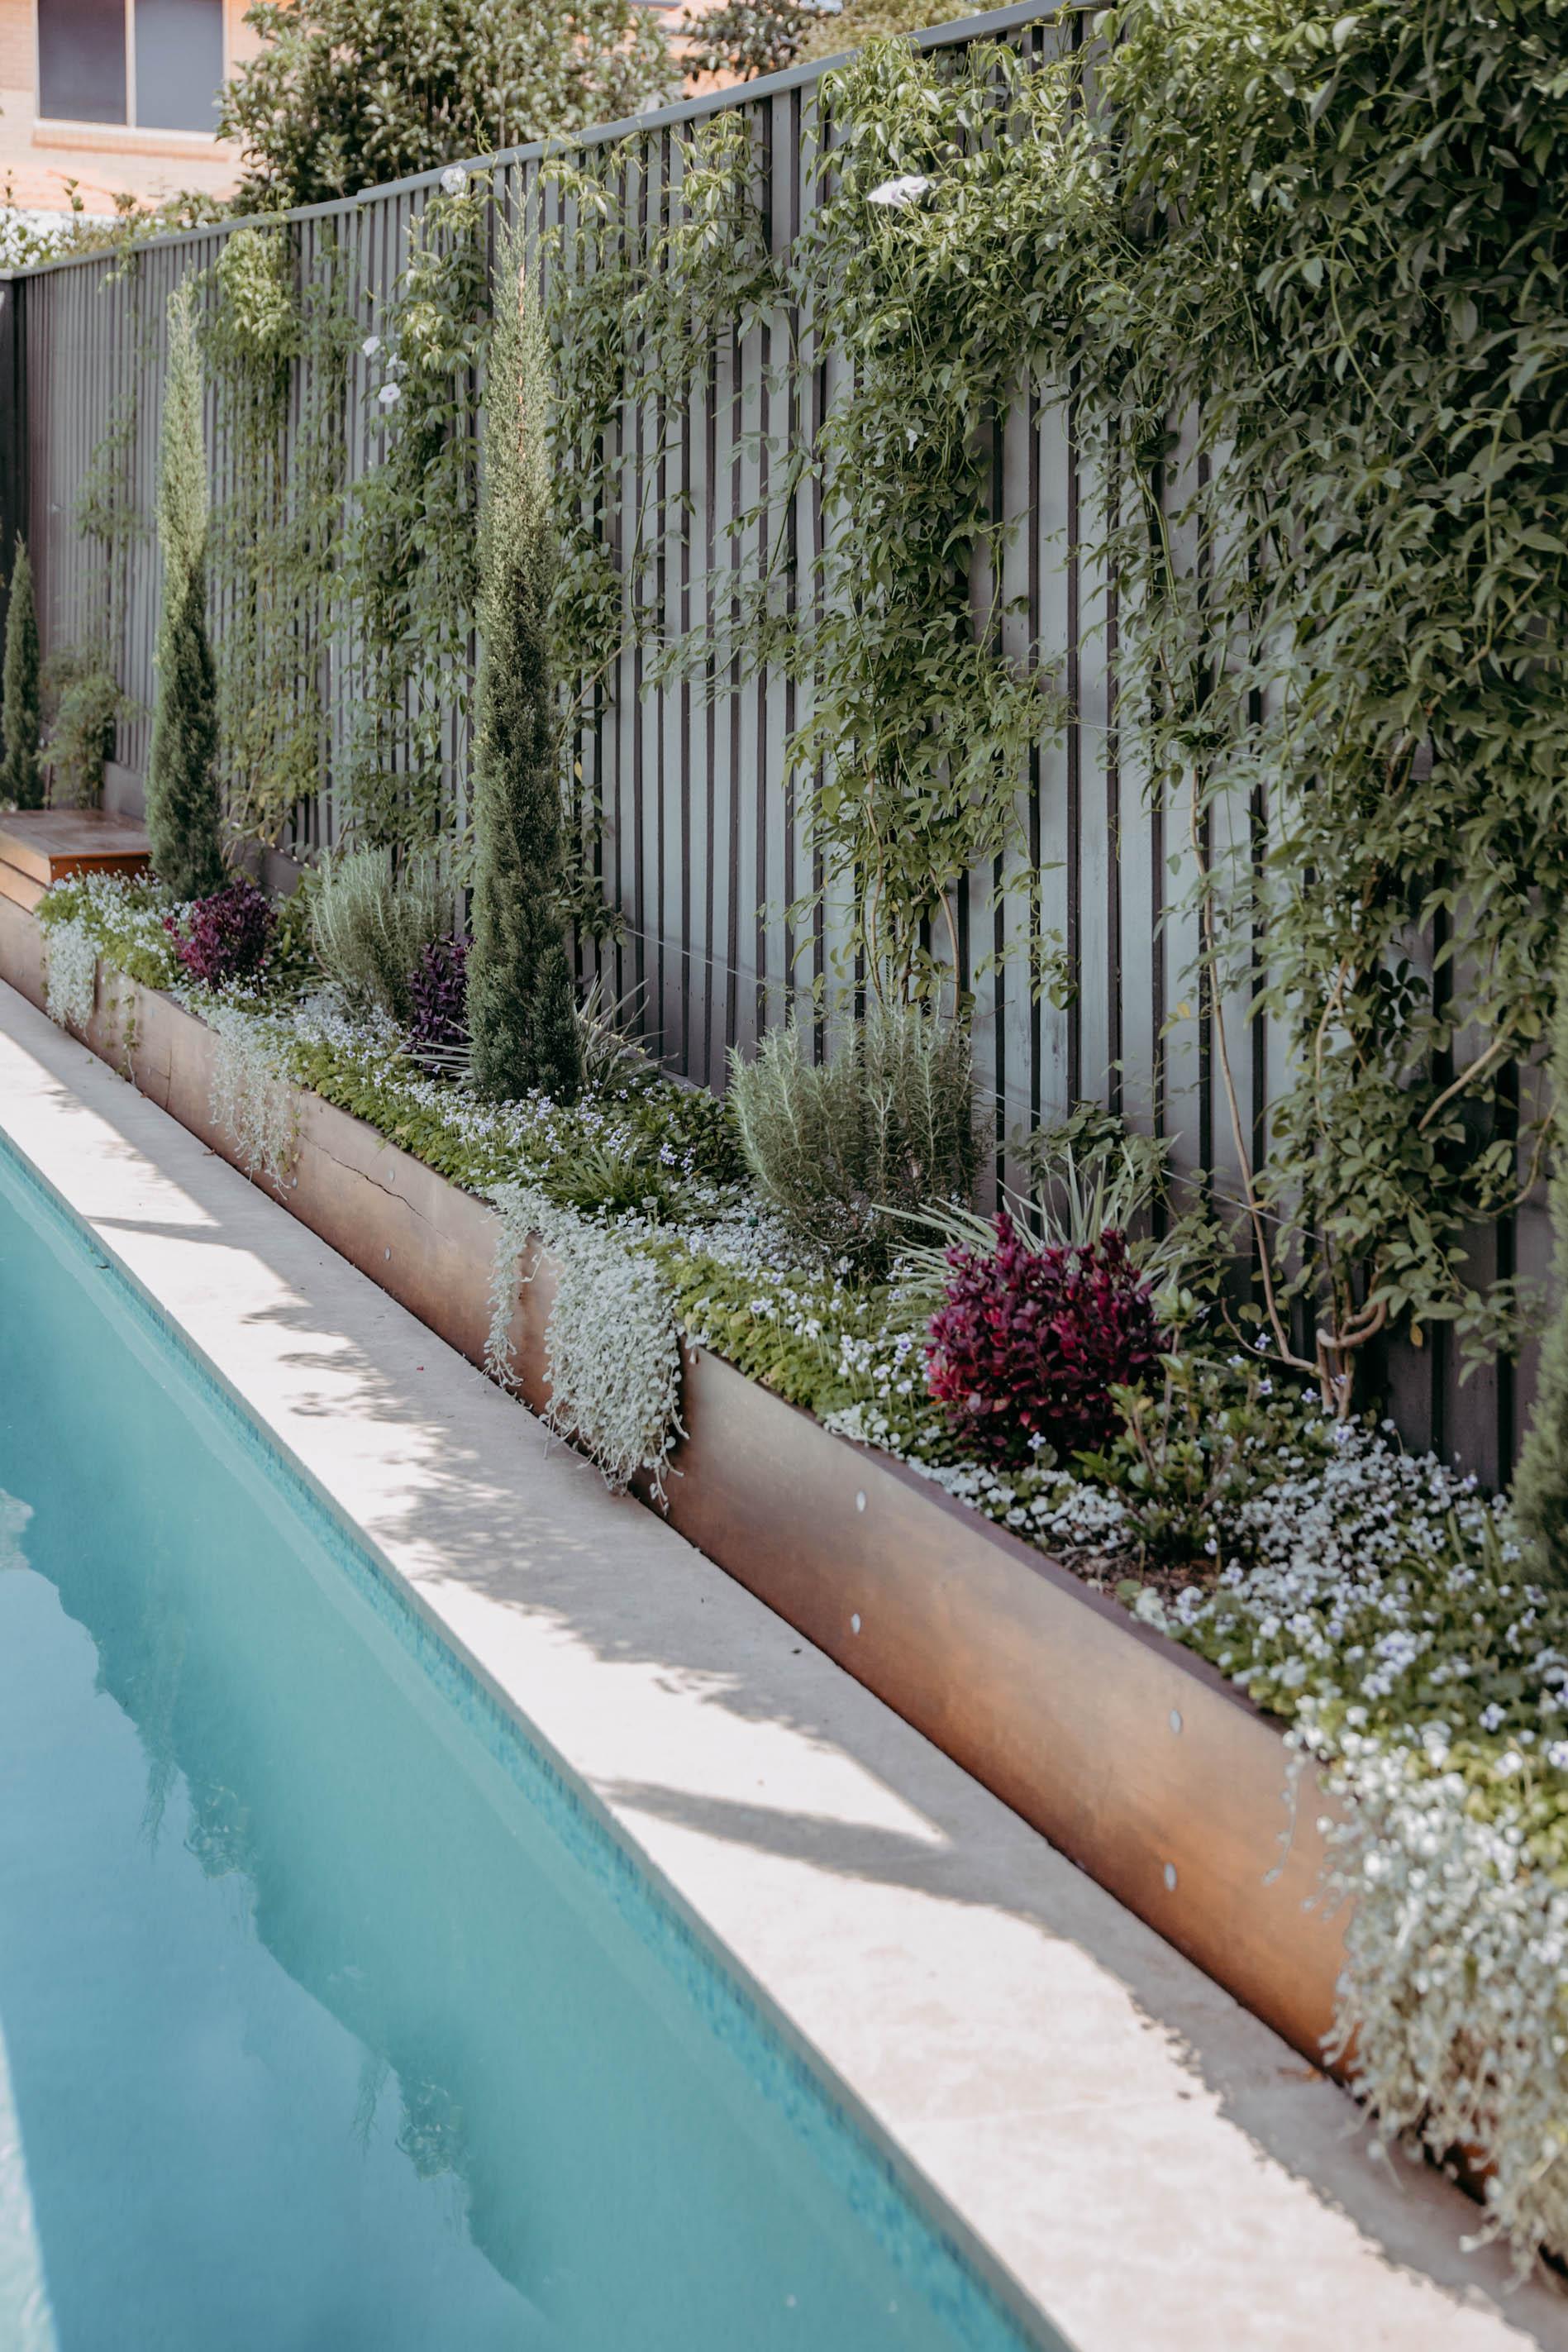 Blog hero-article-images ultimate-guide-vertical-garden